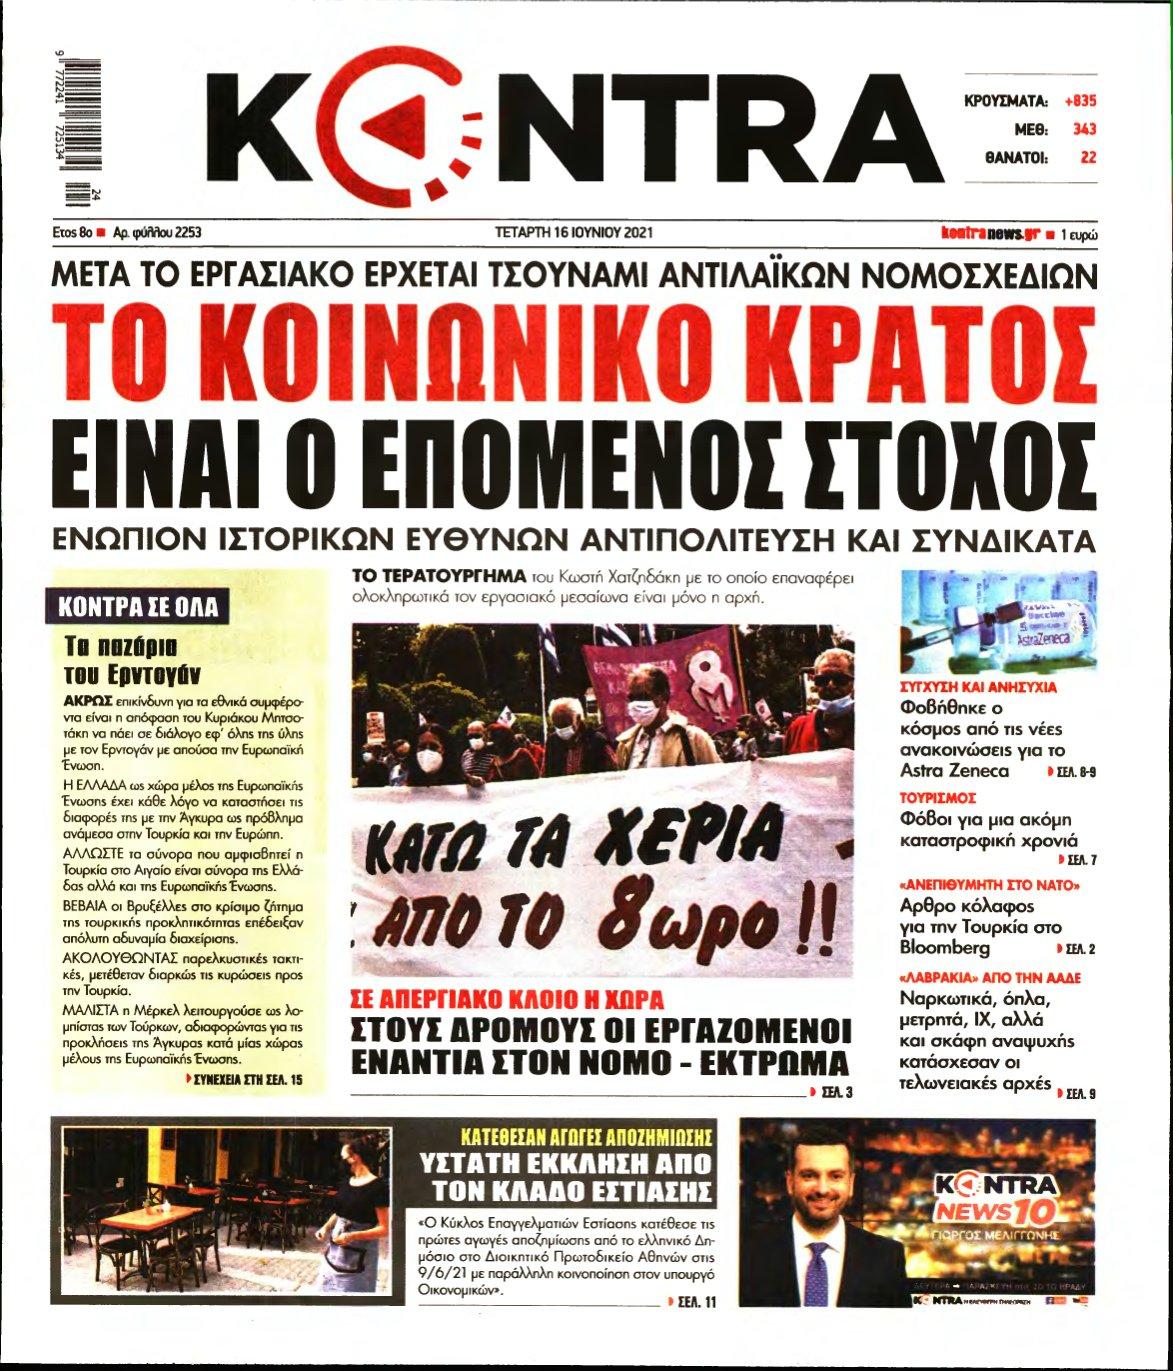 KONTRA NEWS – 16/06/2021